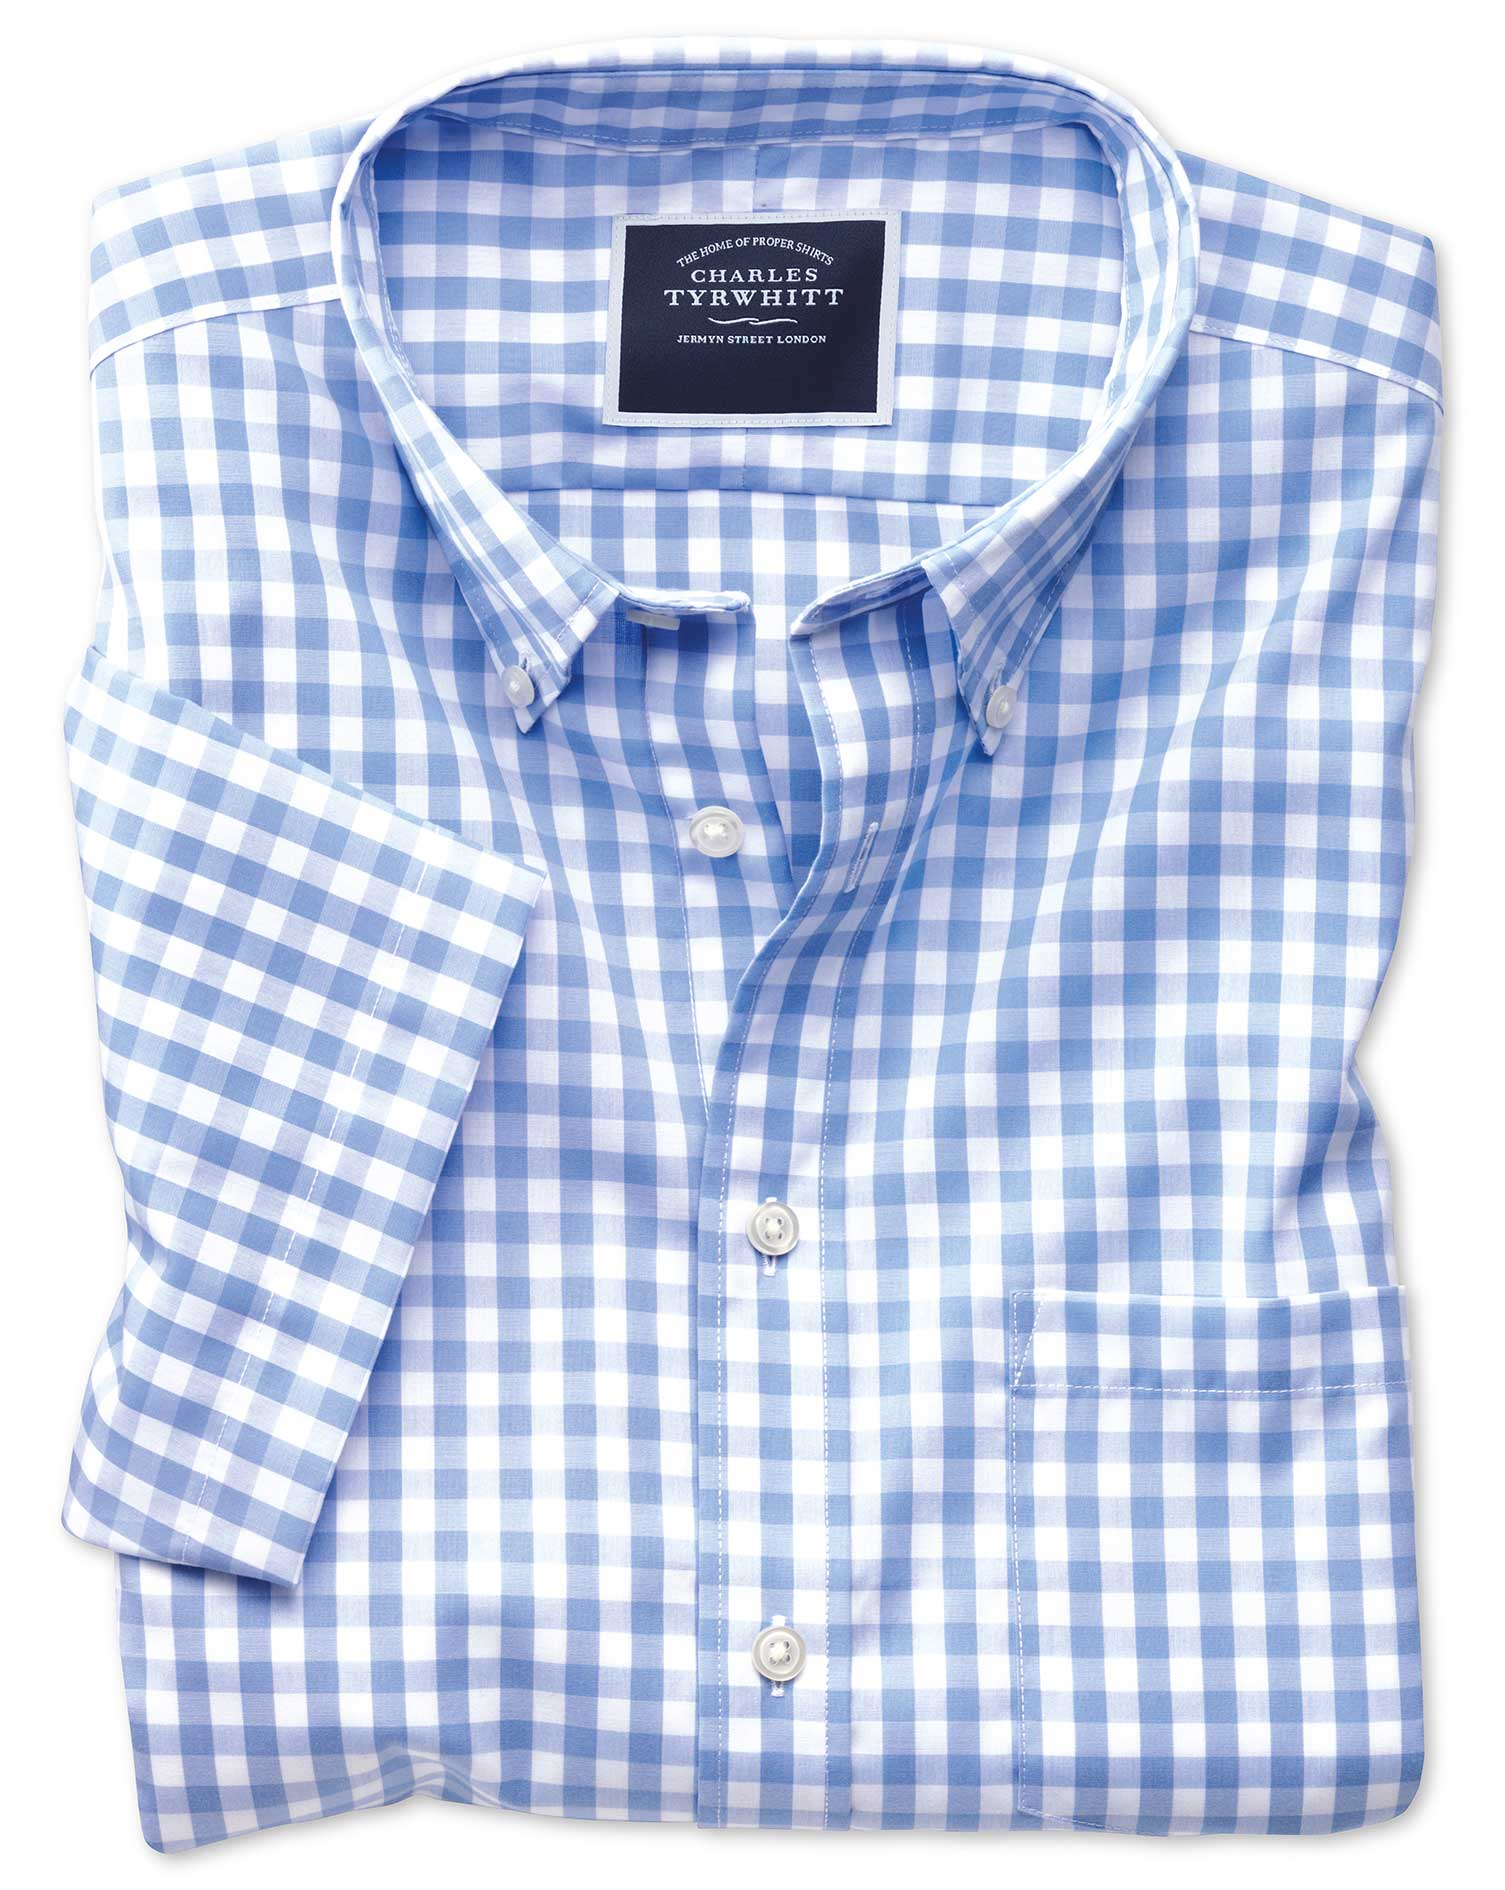 Slim Fit Button-Down Non-Iron Poplin Short Sleeve Sky Blue Gingham Cotton Shirt Single Cuff Size XXL